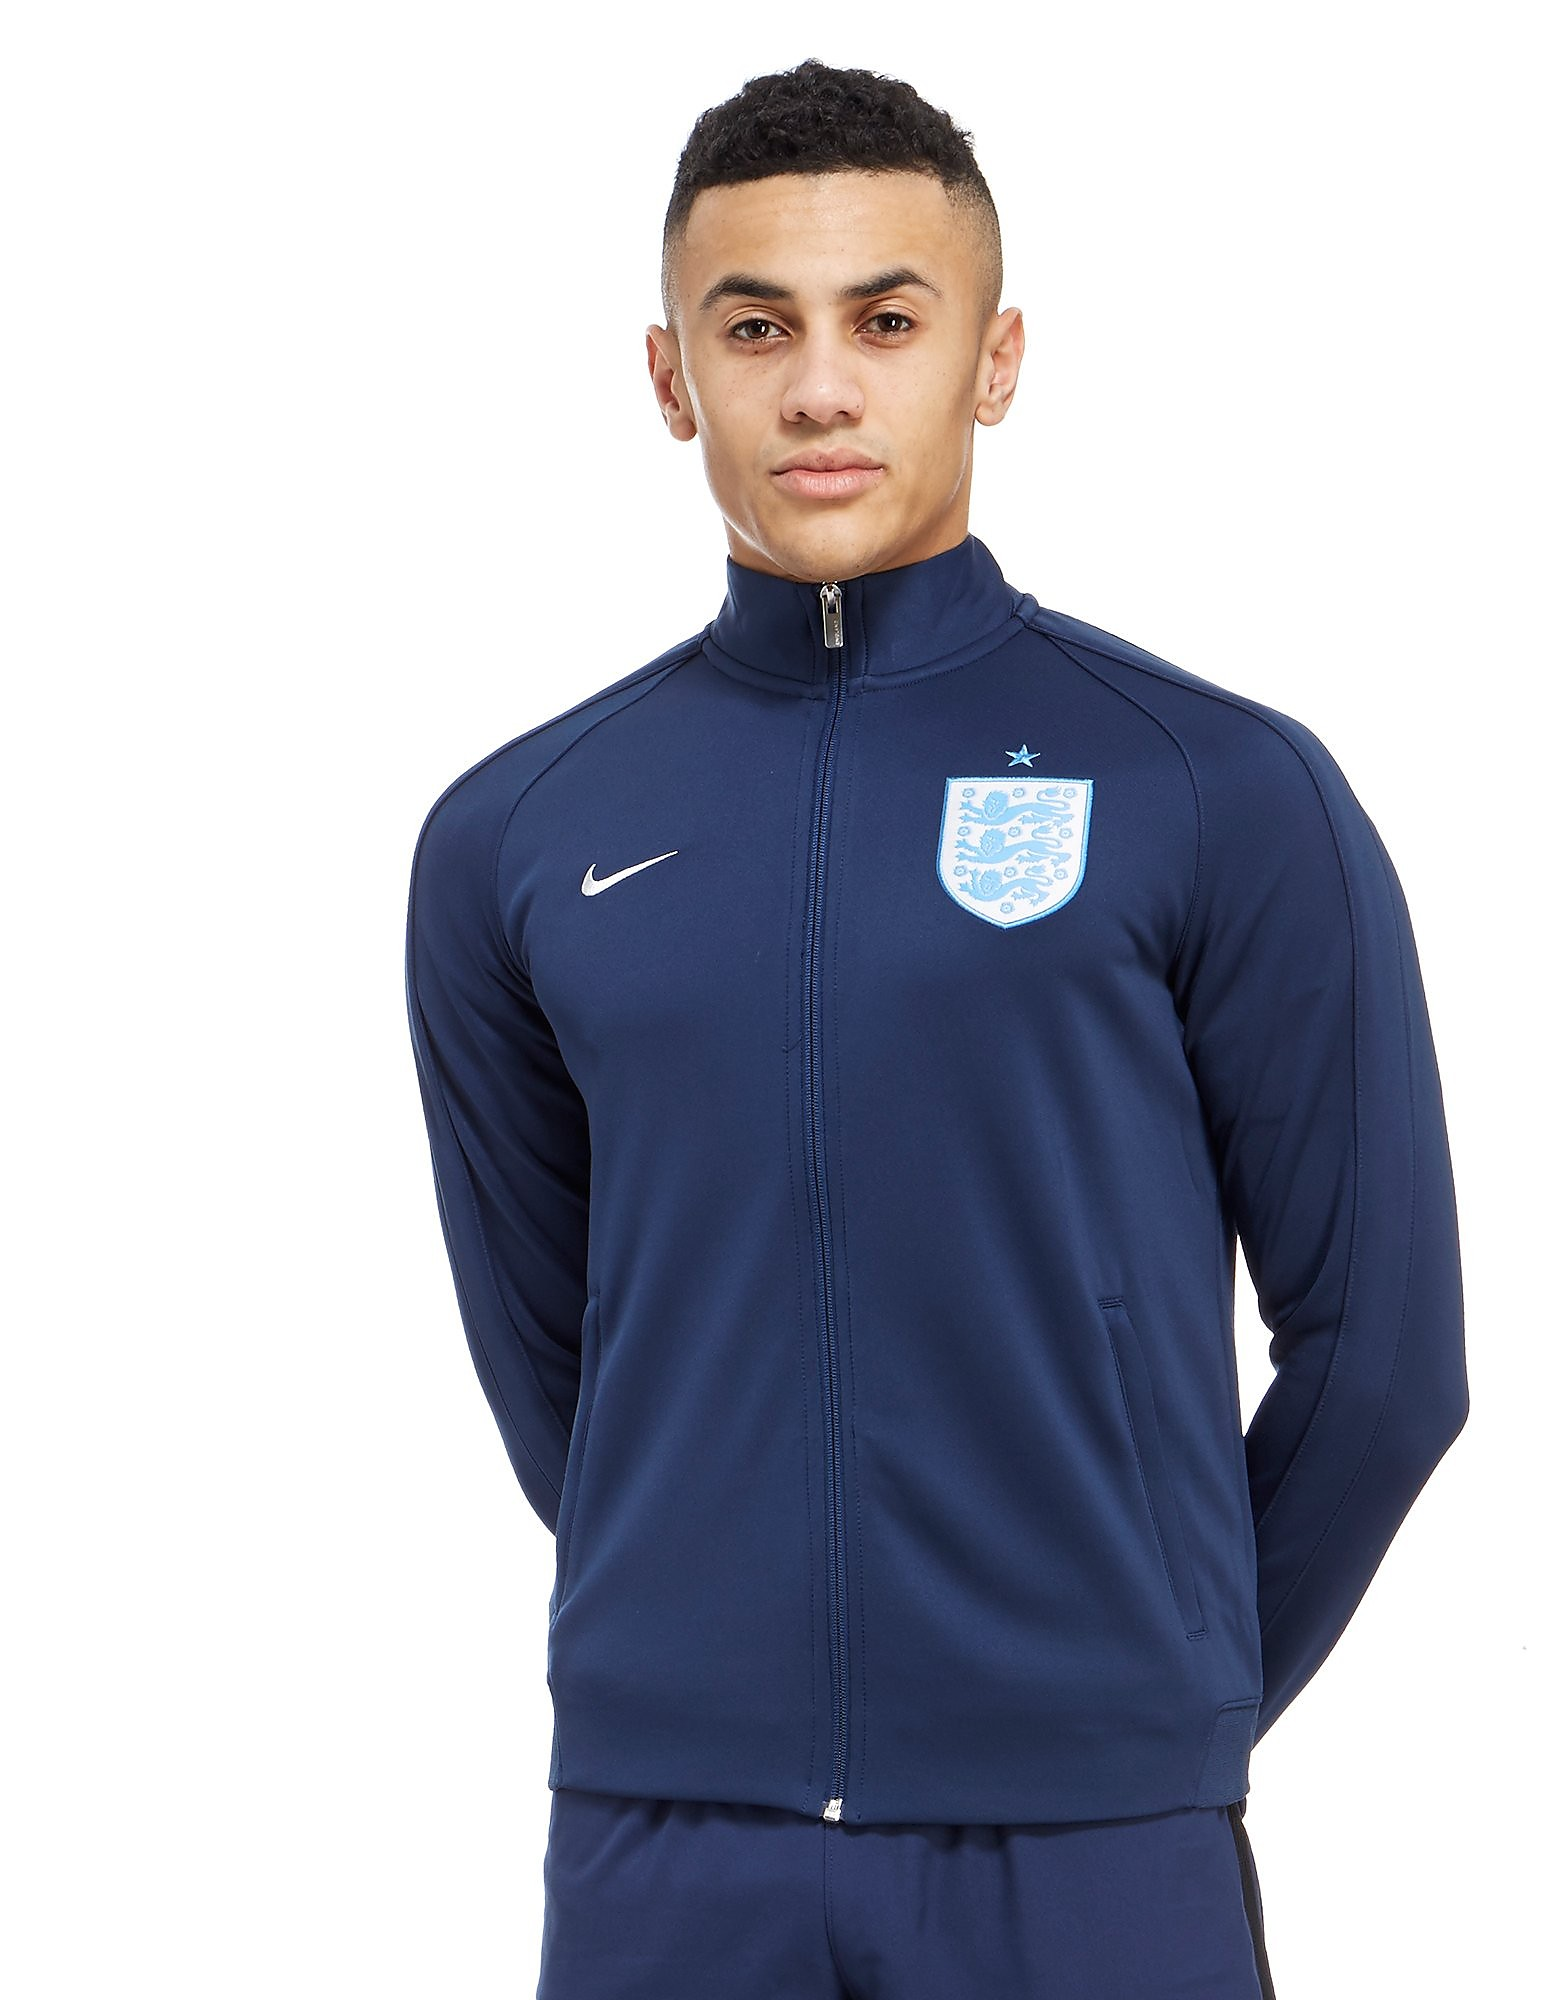 Nike Veste de survêtement N98 Angleterre 2017 Homme